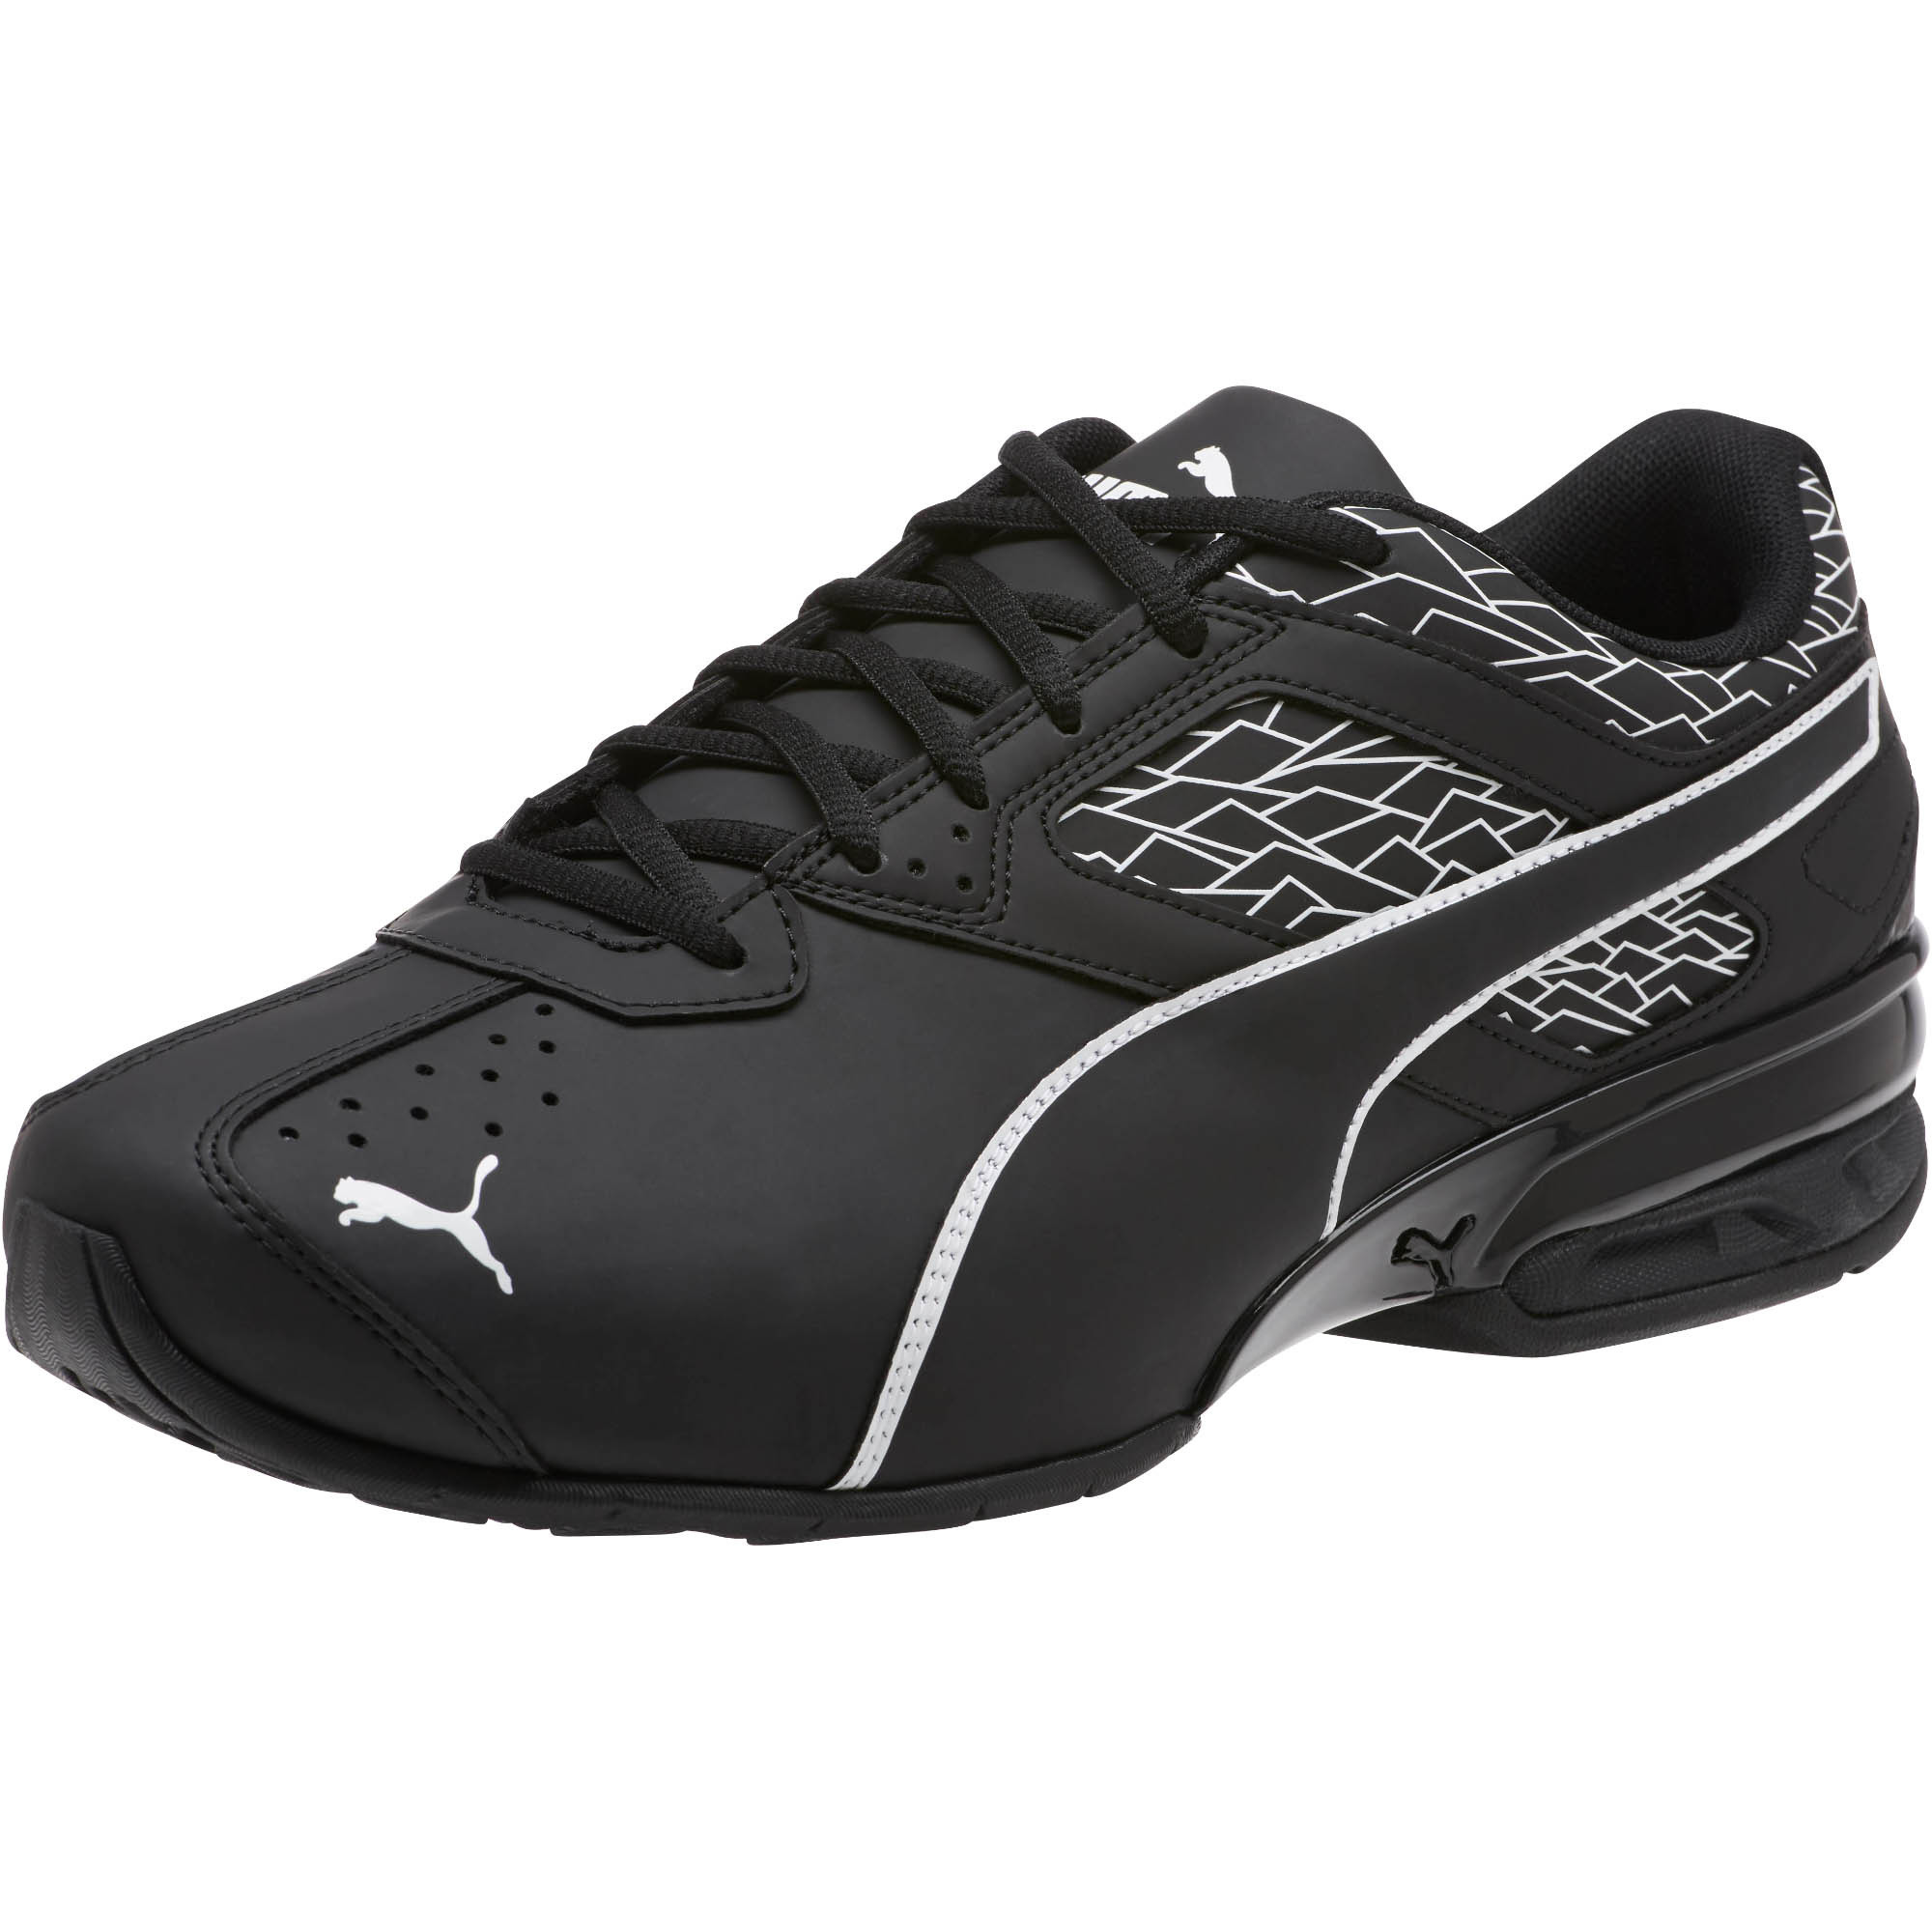 PUMA-Men-039-s-Tazon-6-Fracture-FM-Wide-Sneakers miniatura 4